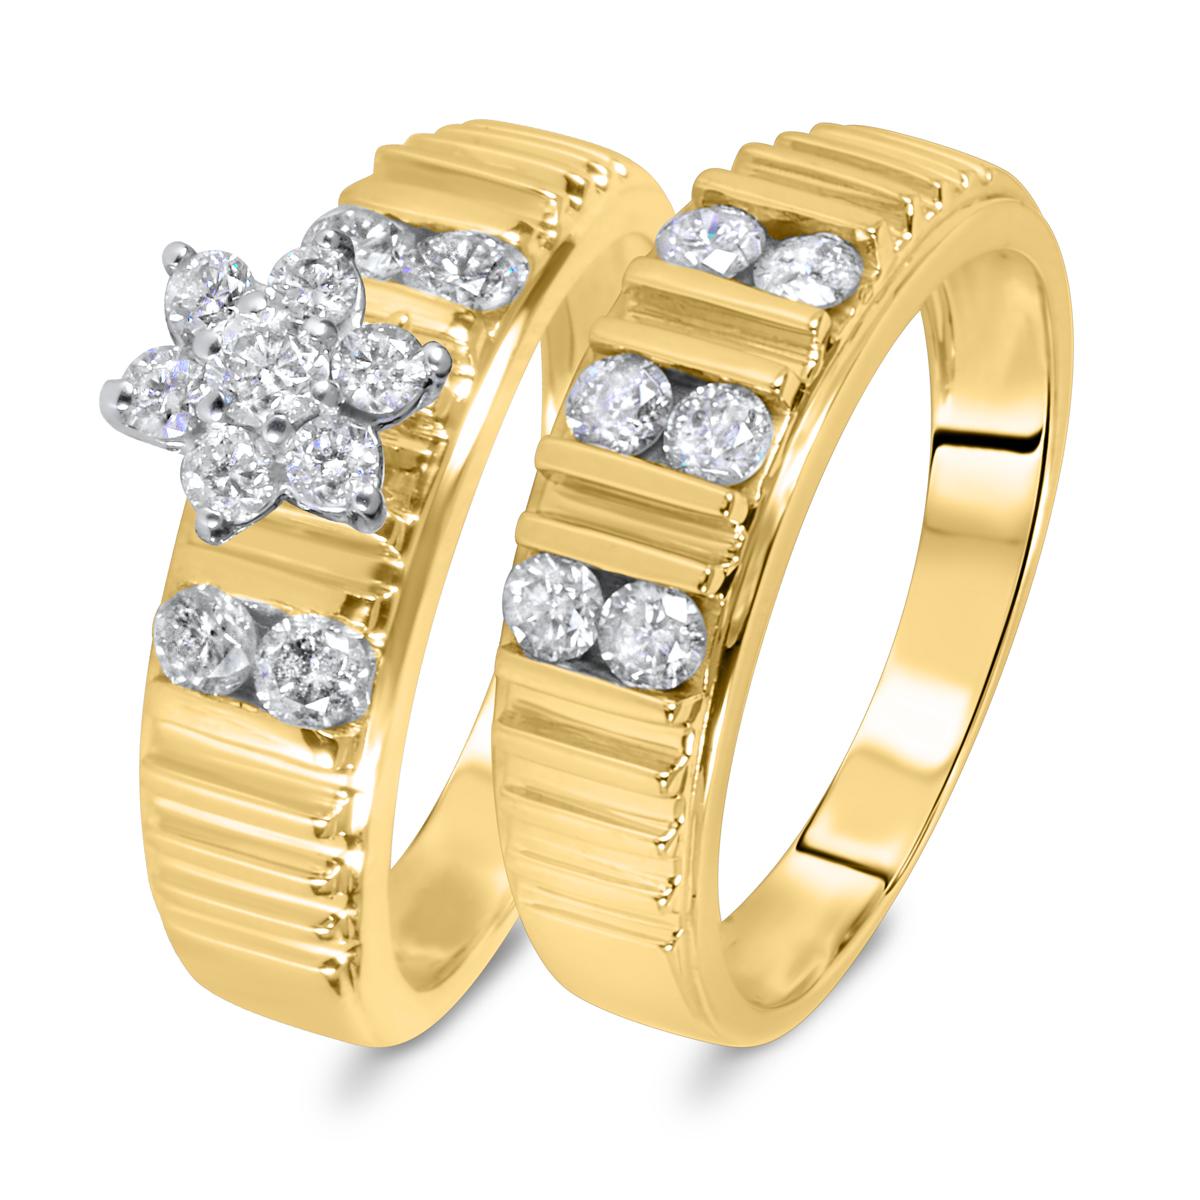 7/8 CT. T.W. Diamond Women's Bridal Wedding Ring Set 14K Yellow Gold